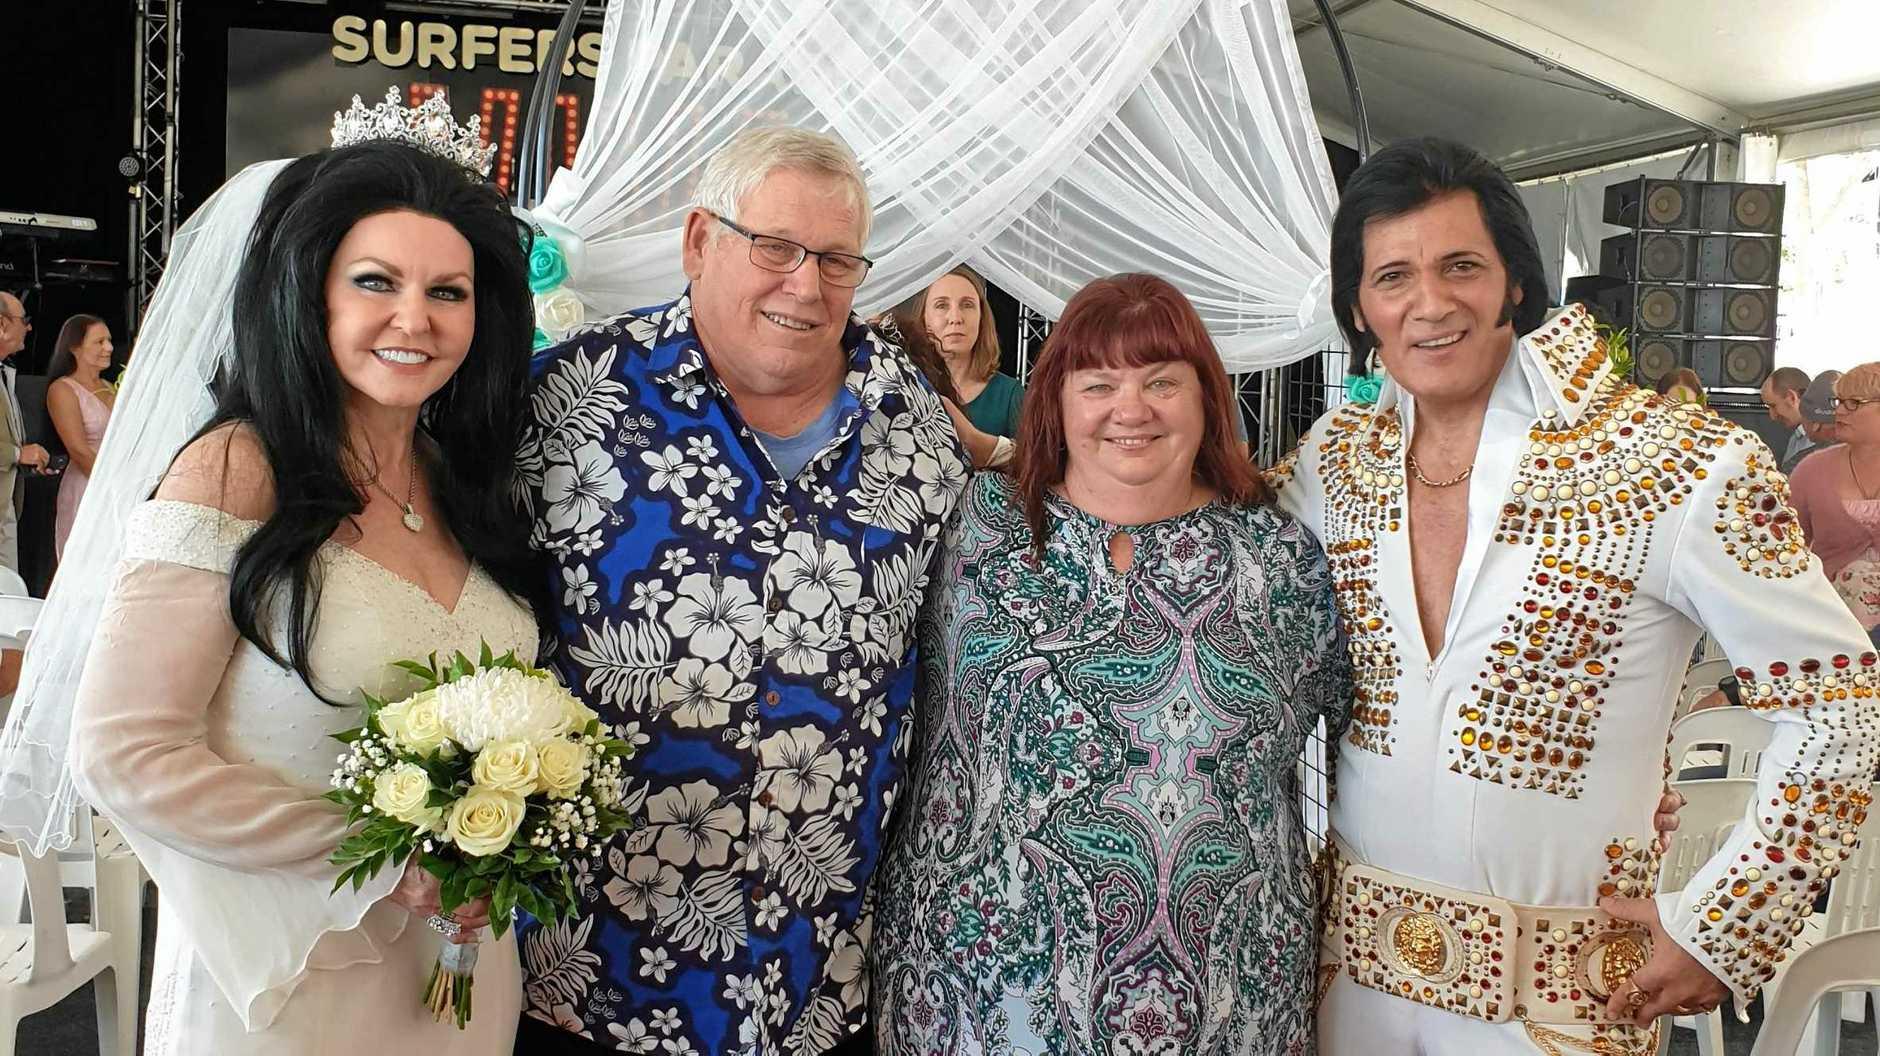 LOVE ME TENDER: Marriage celebrant Dean Vegas, aka Elvis (right) and